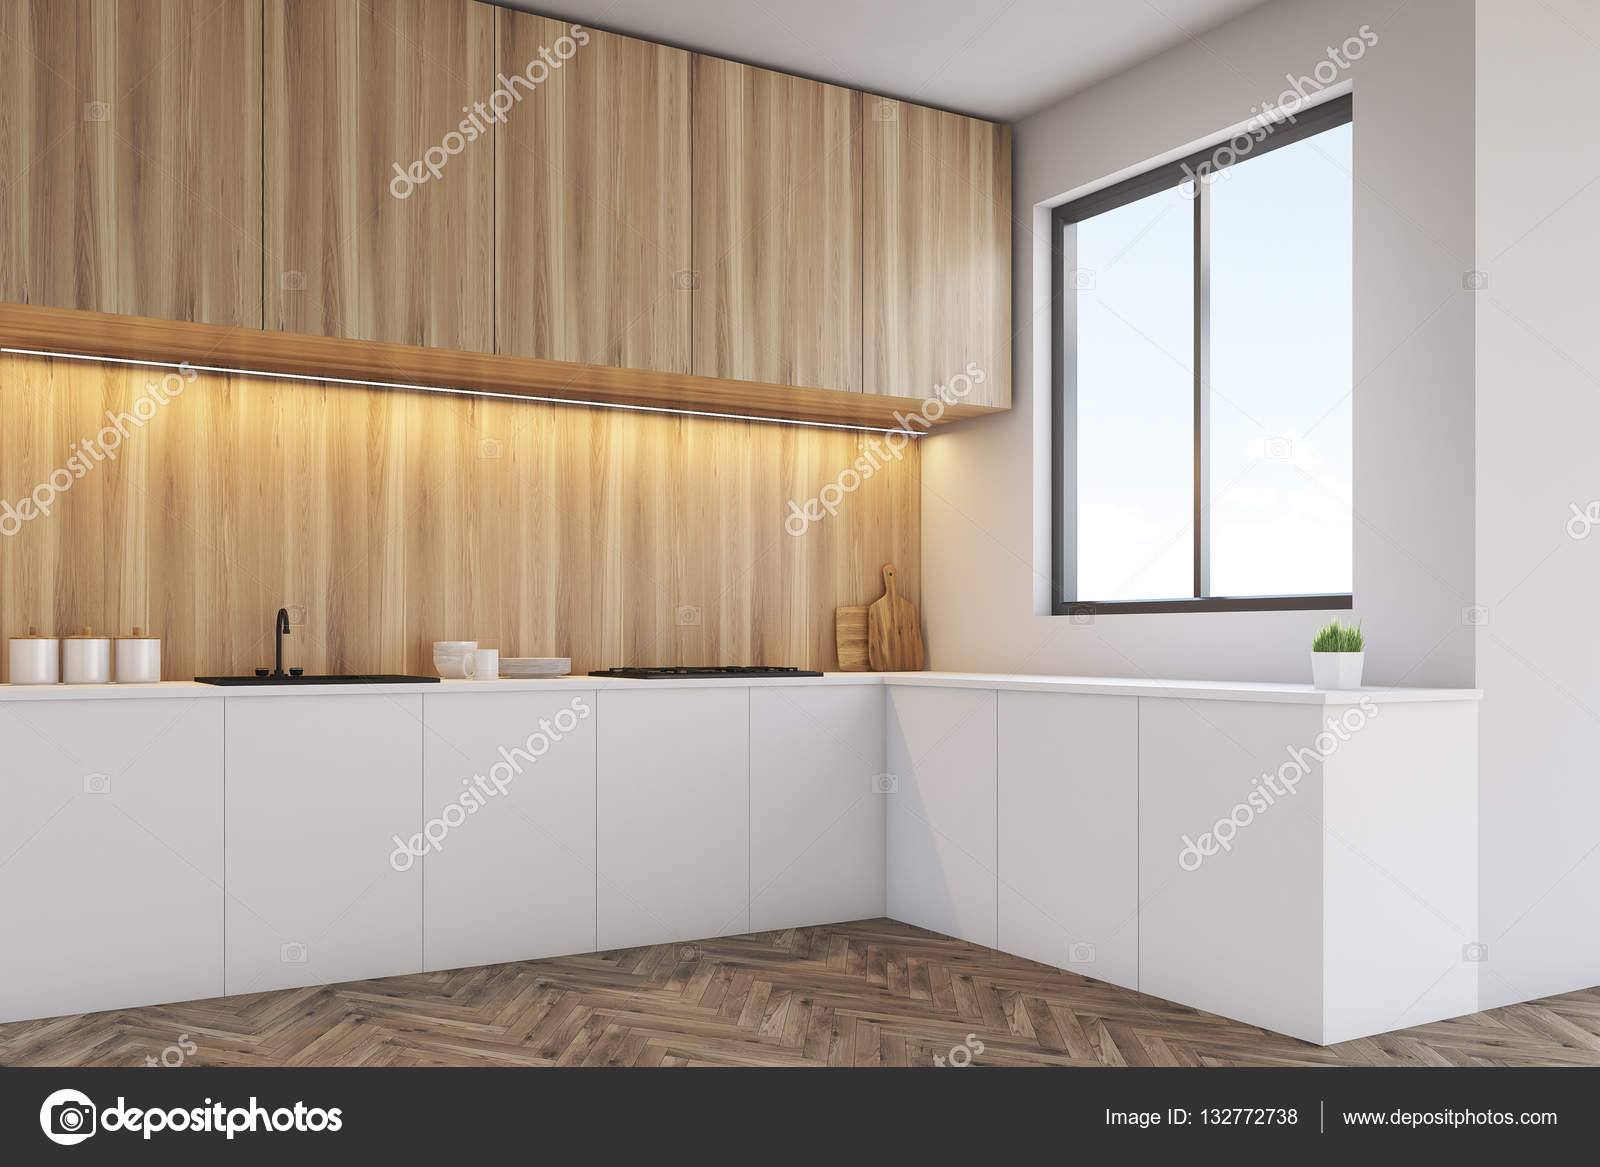 Esquina de un mostrador de cocina con muebles de madera clara ...